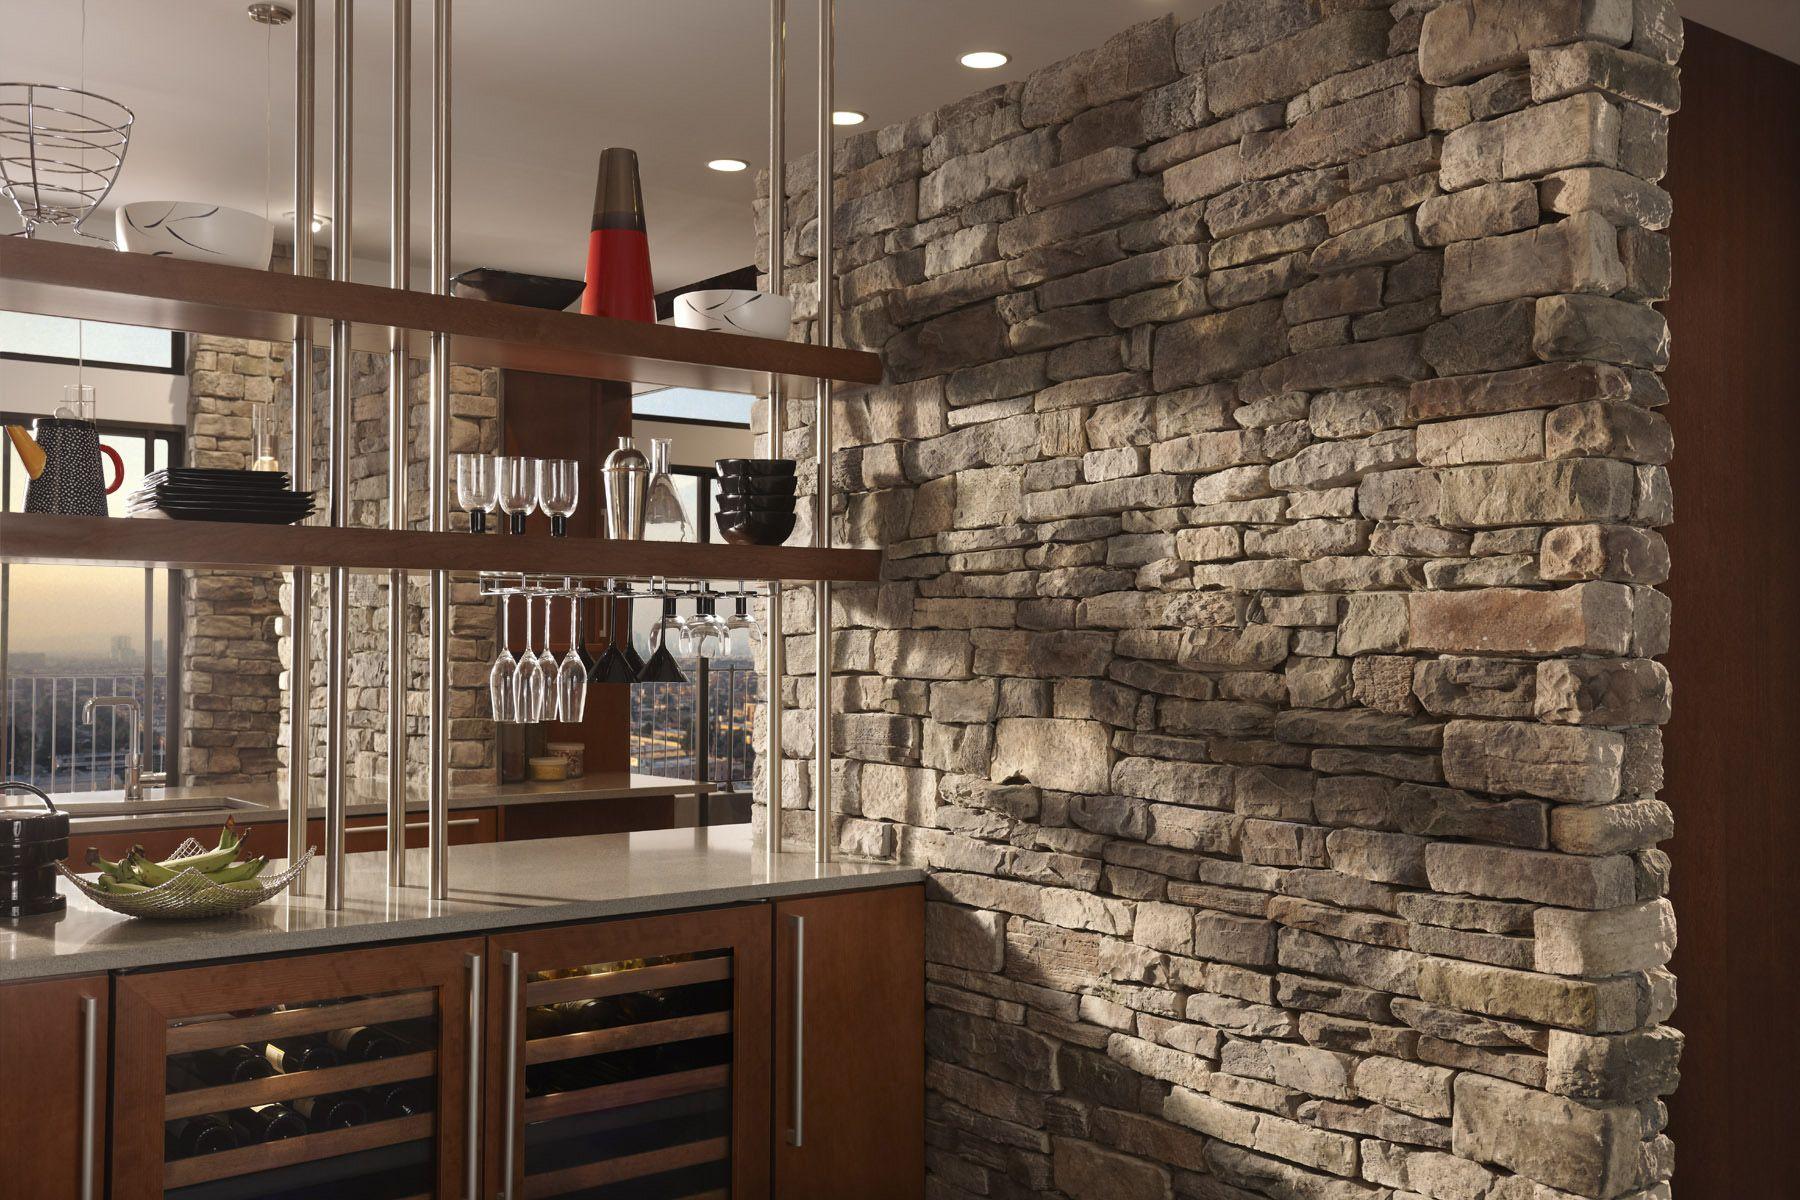 Ridgestone Ply Gem Stone Walls Interior Stone Veneer Panels Stone Veneer Indoor faux stone wall panels